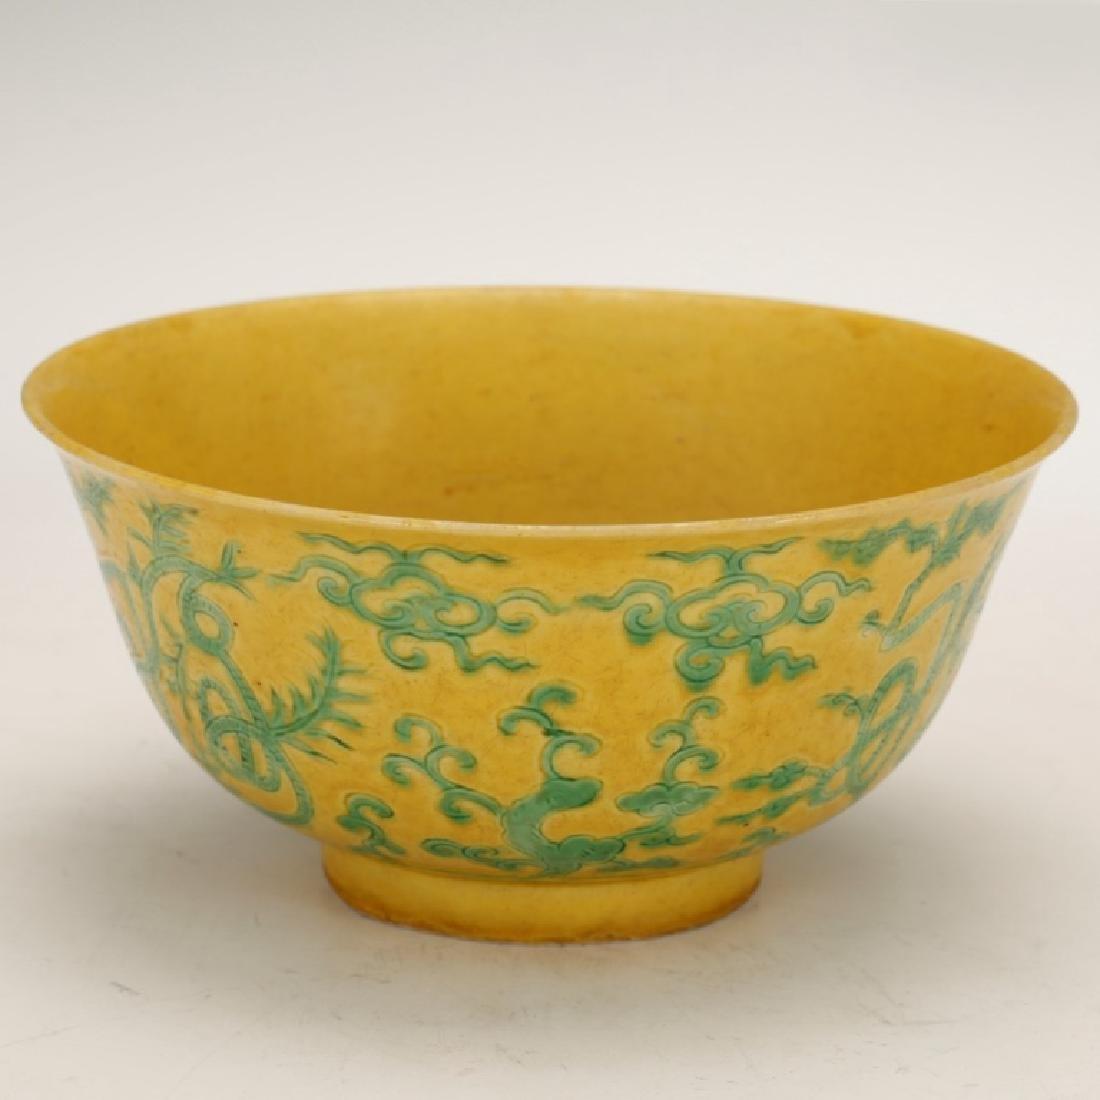 Fine Chinese Incised Enamel Porcelain Bowl